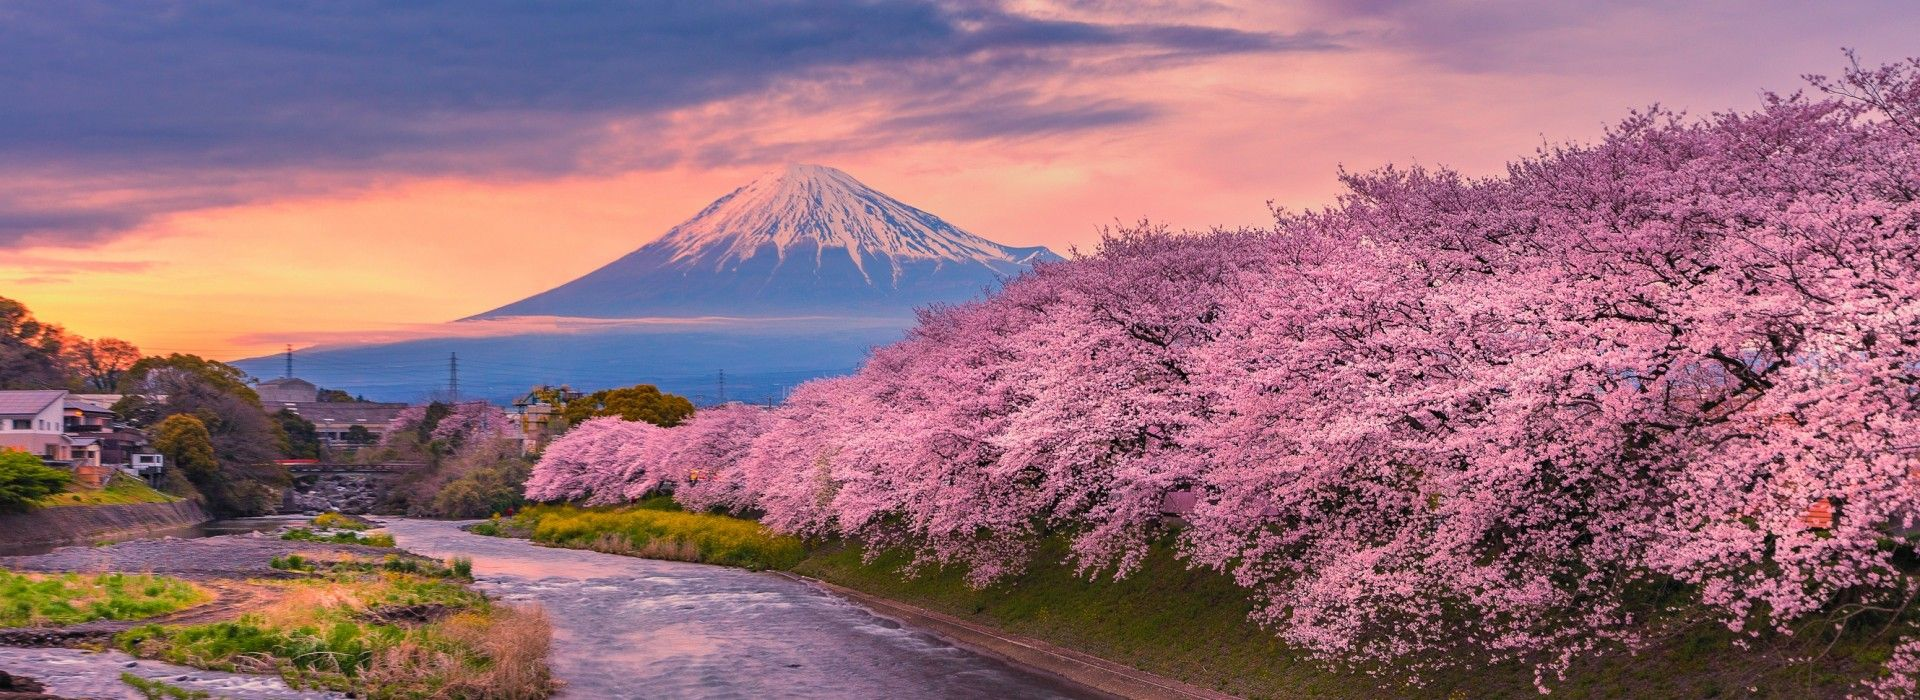 Trekking Tours in Japan